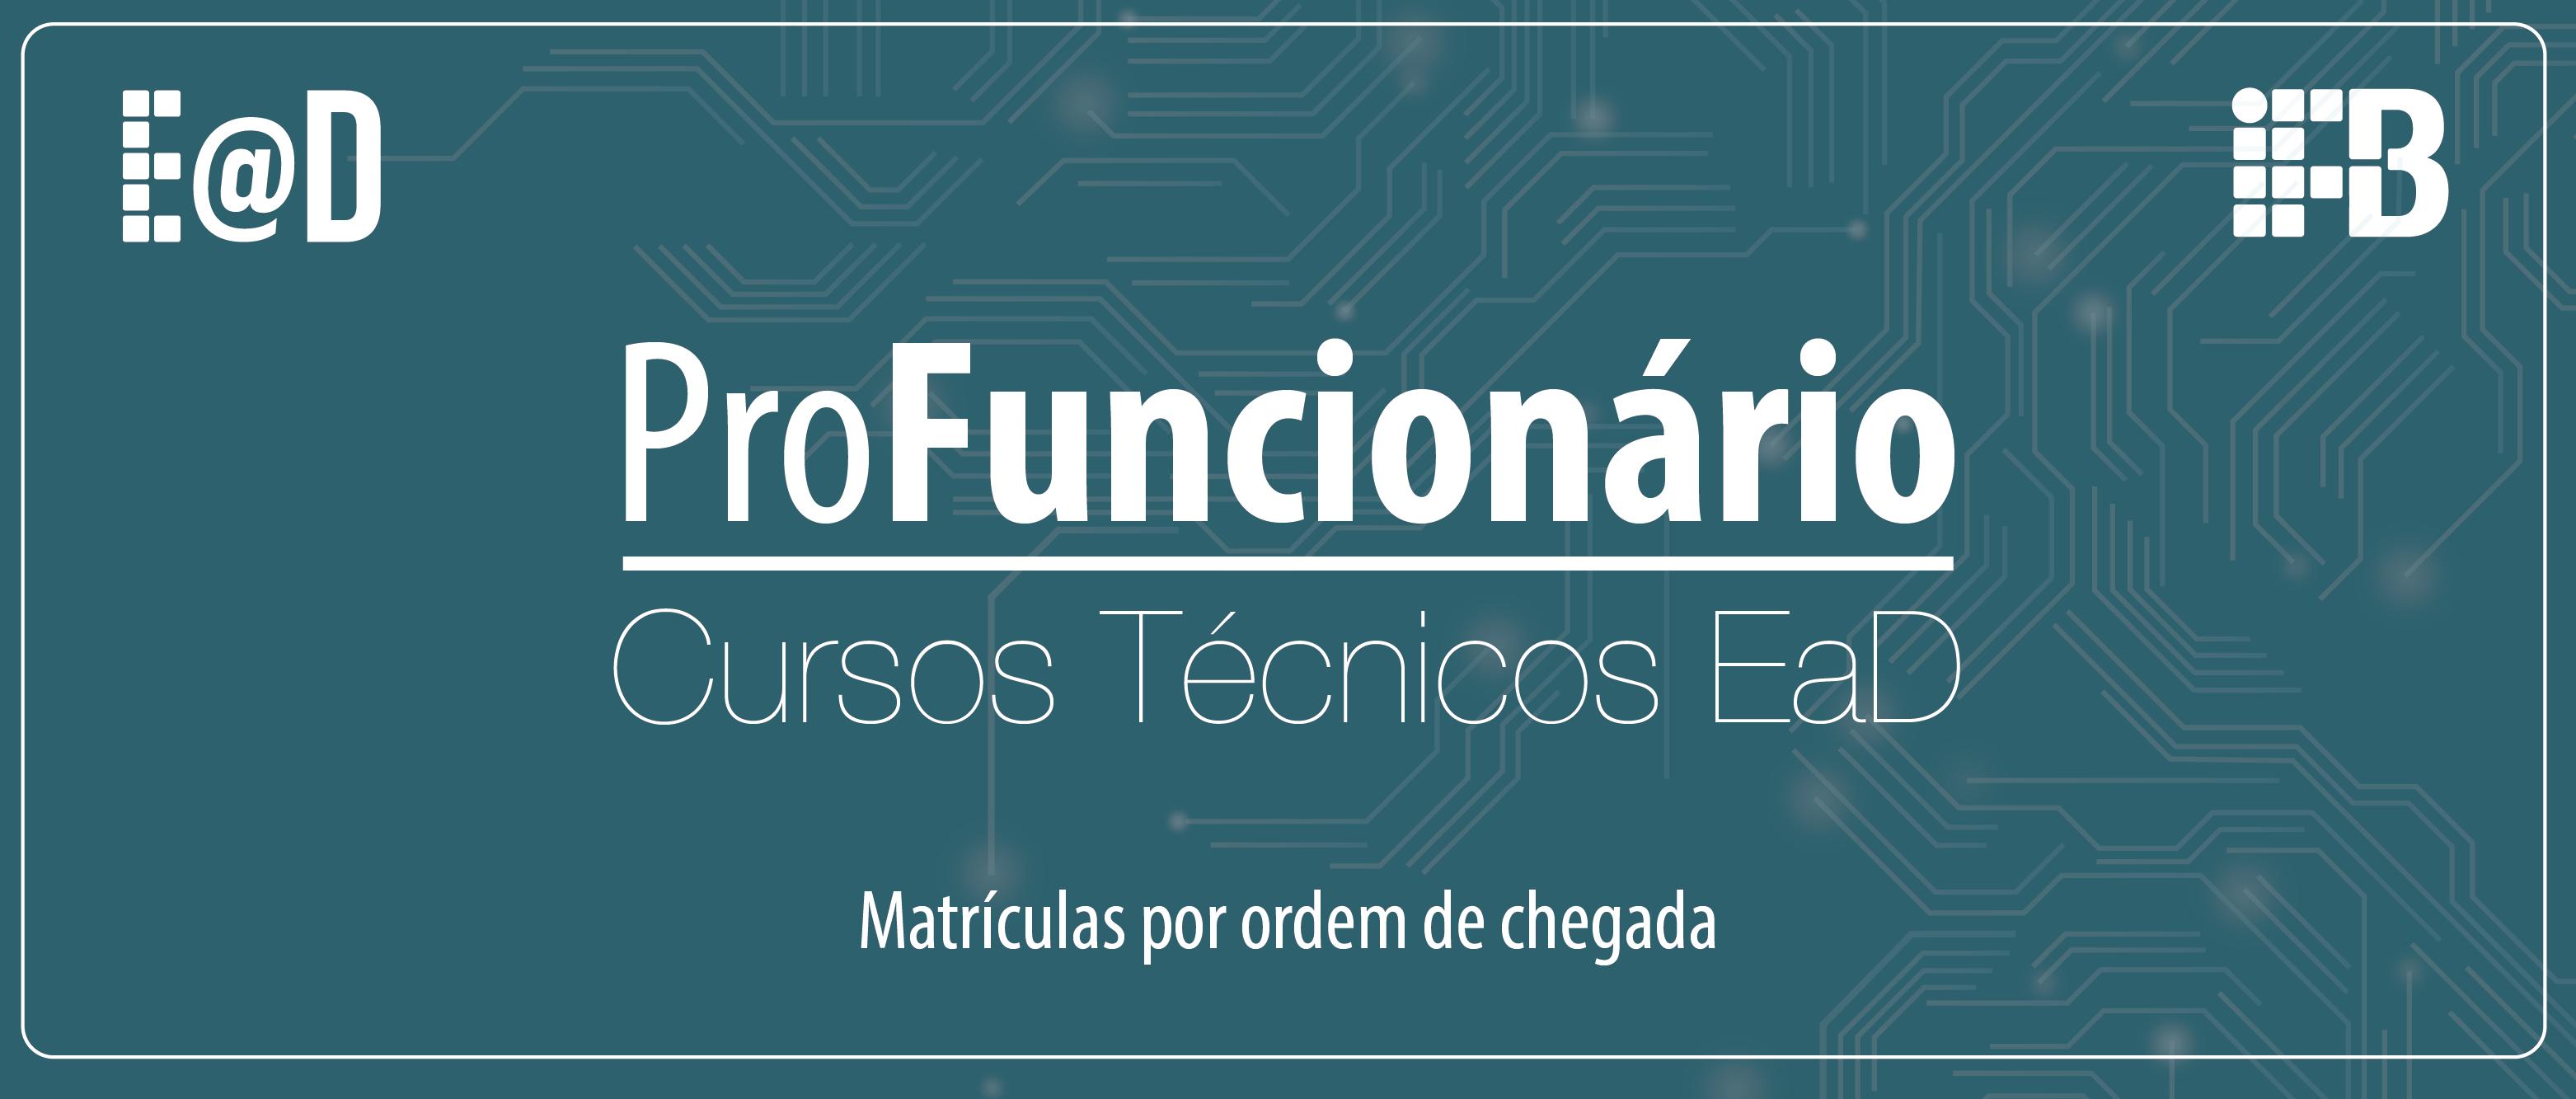 Matrículas abertas para cursos Técnicos EaD do Programa ProFuncionário